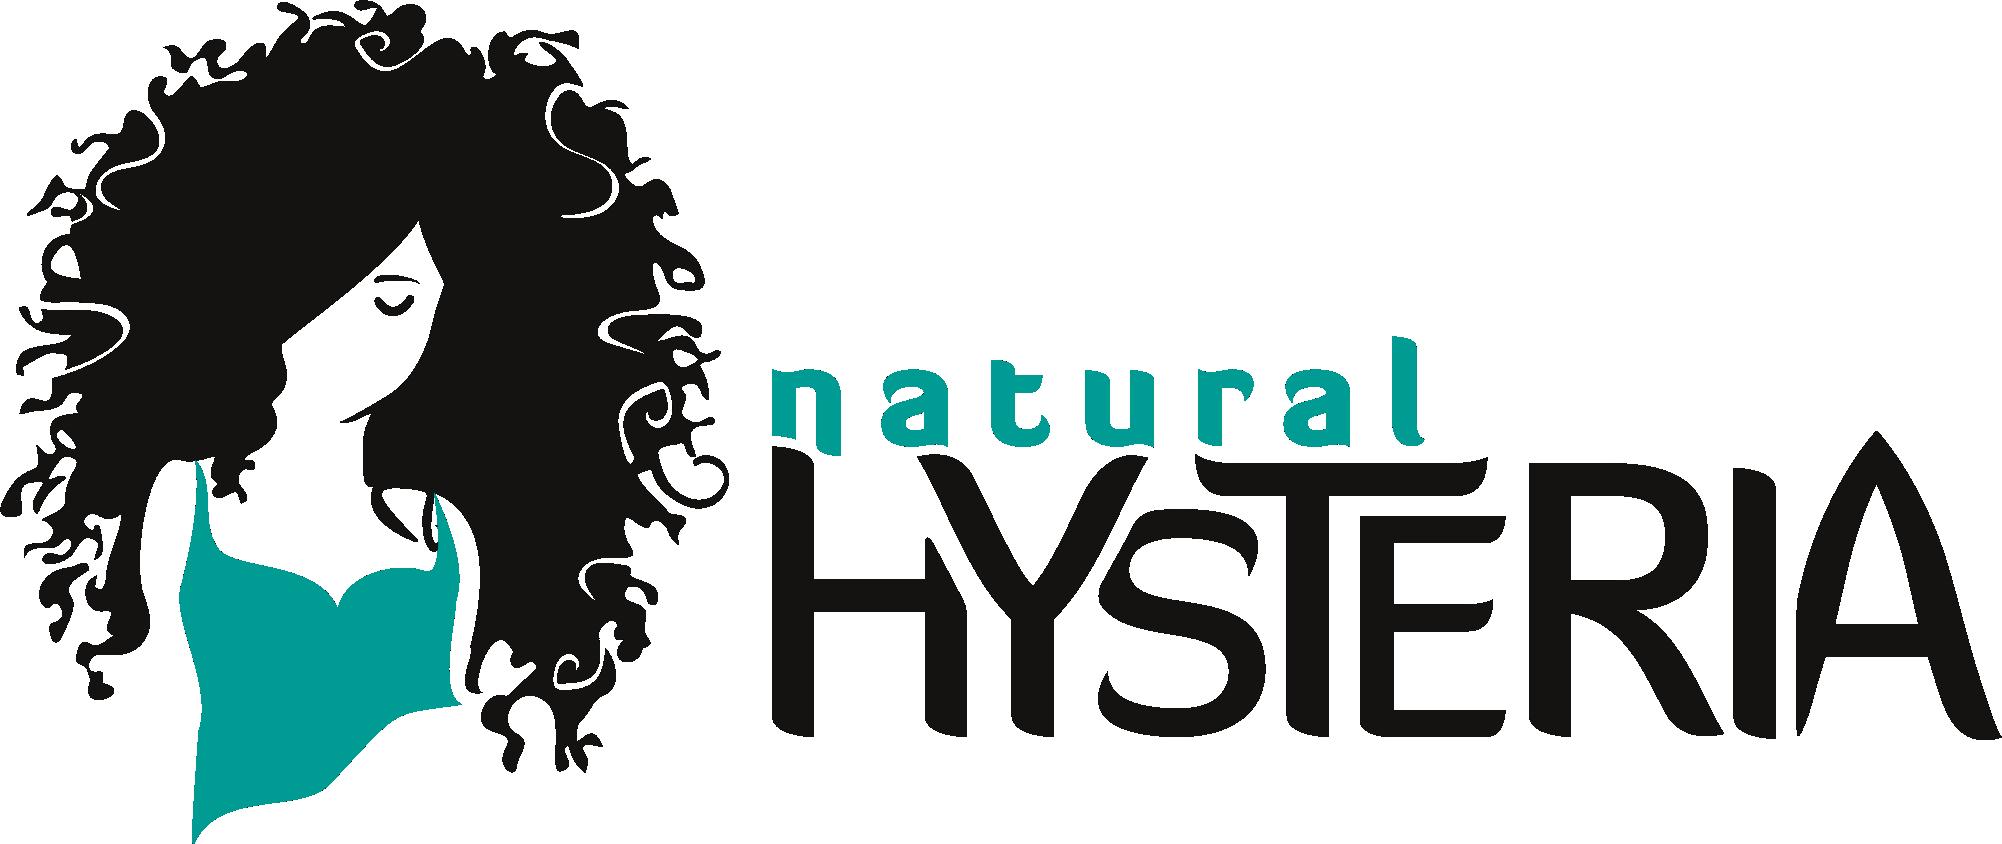 Natural Hysteria